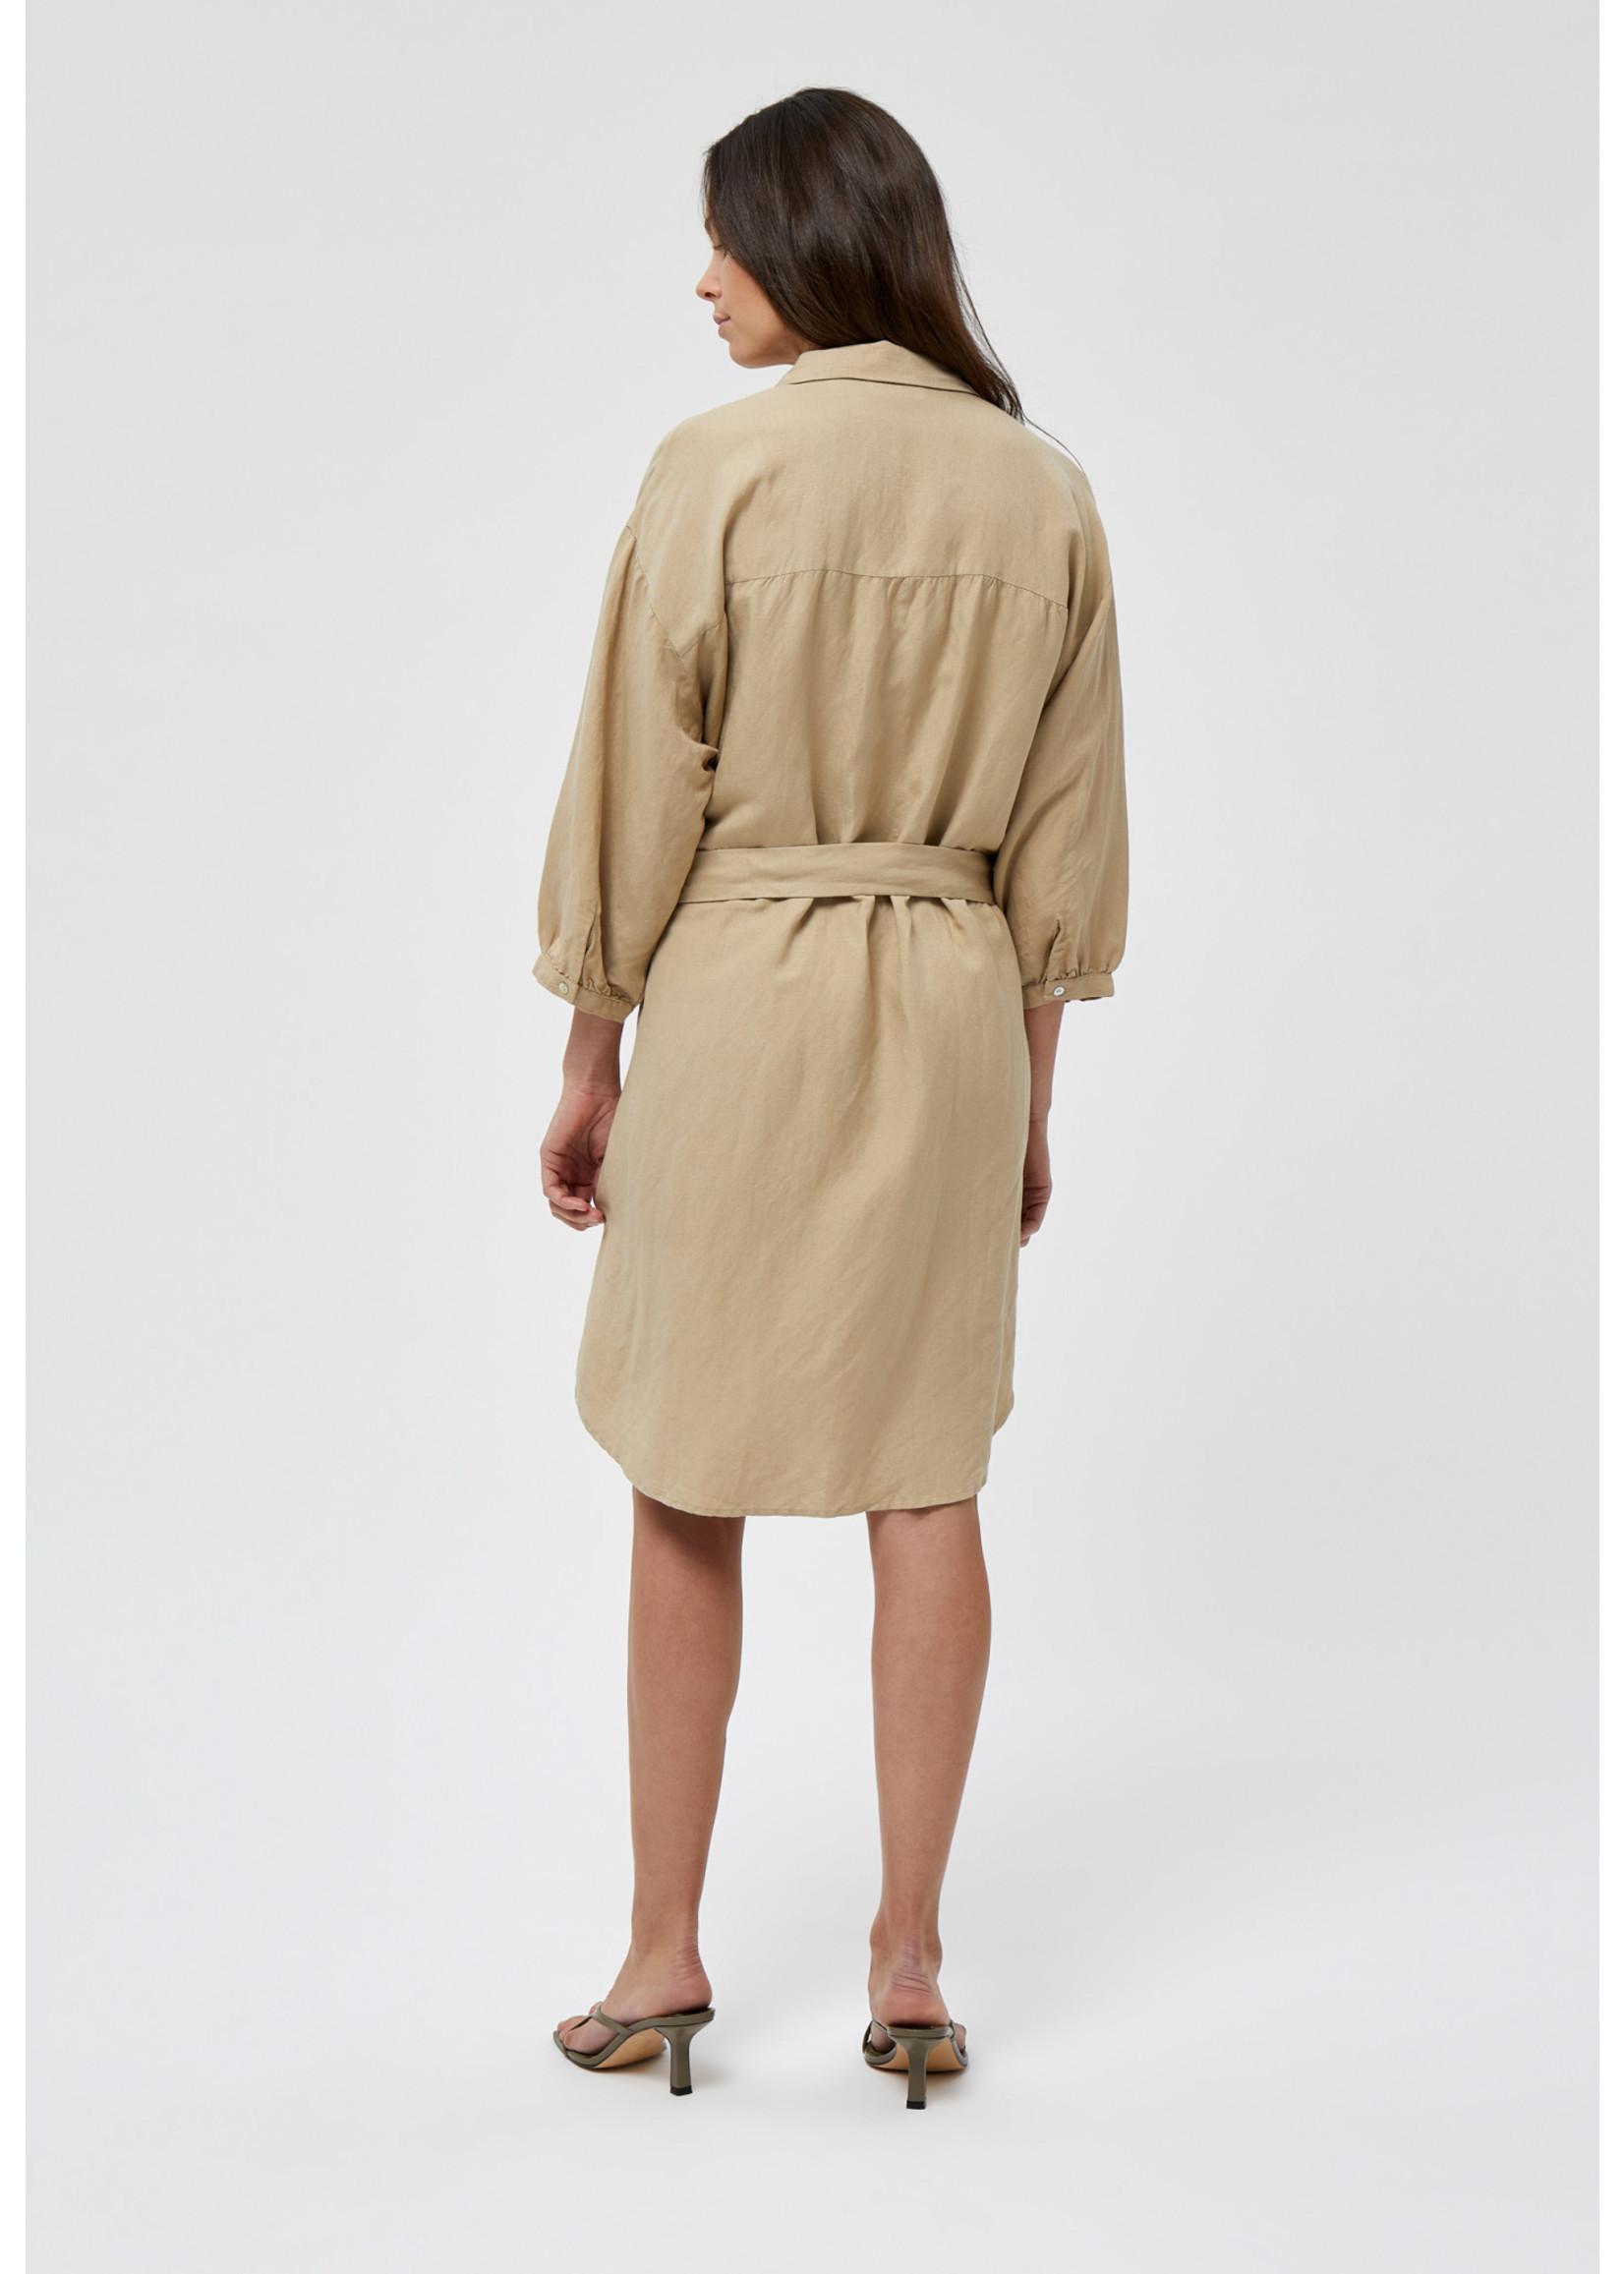 MINUS Makira linen dress Nomad sand